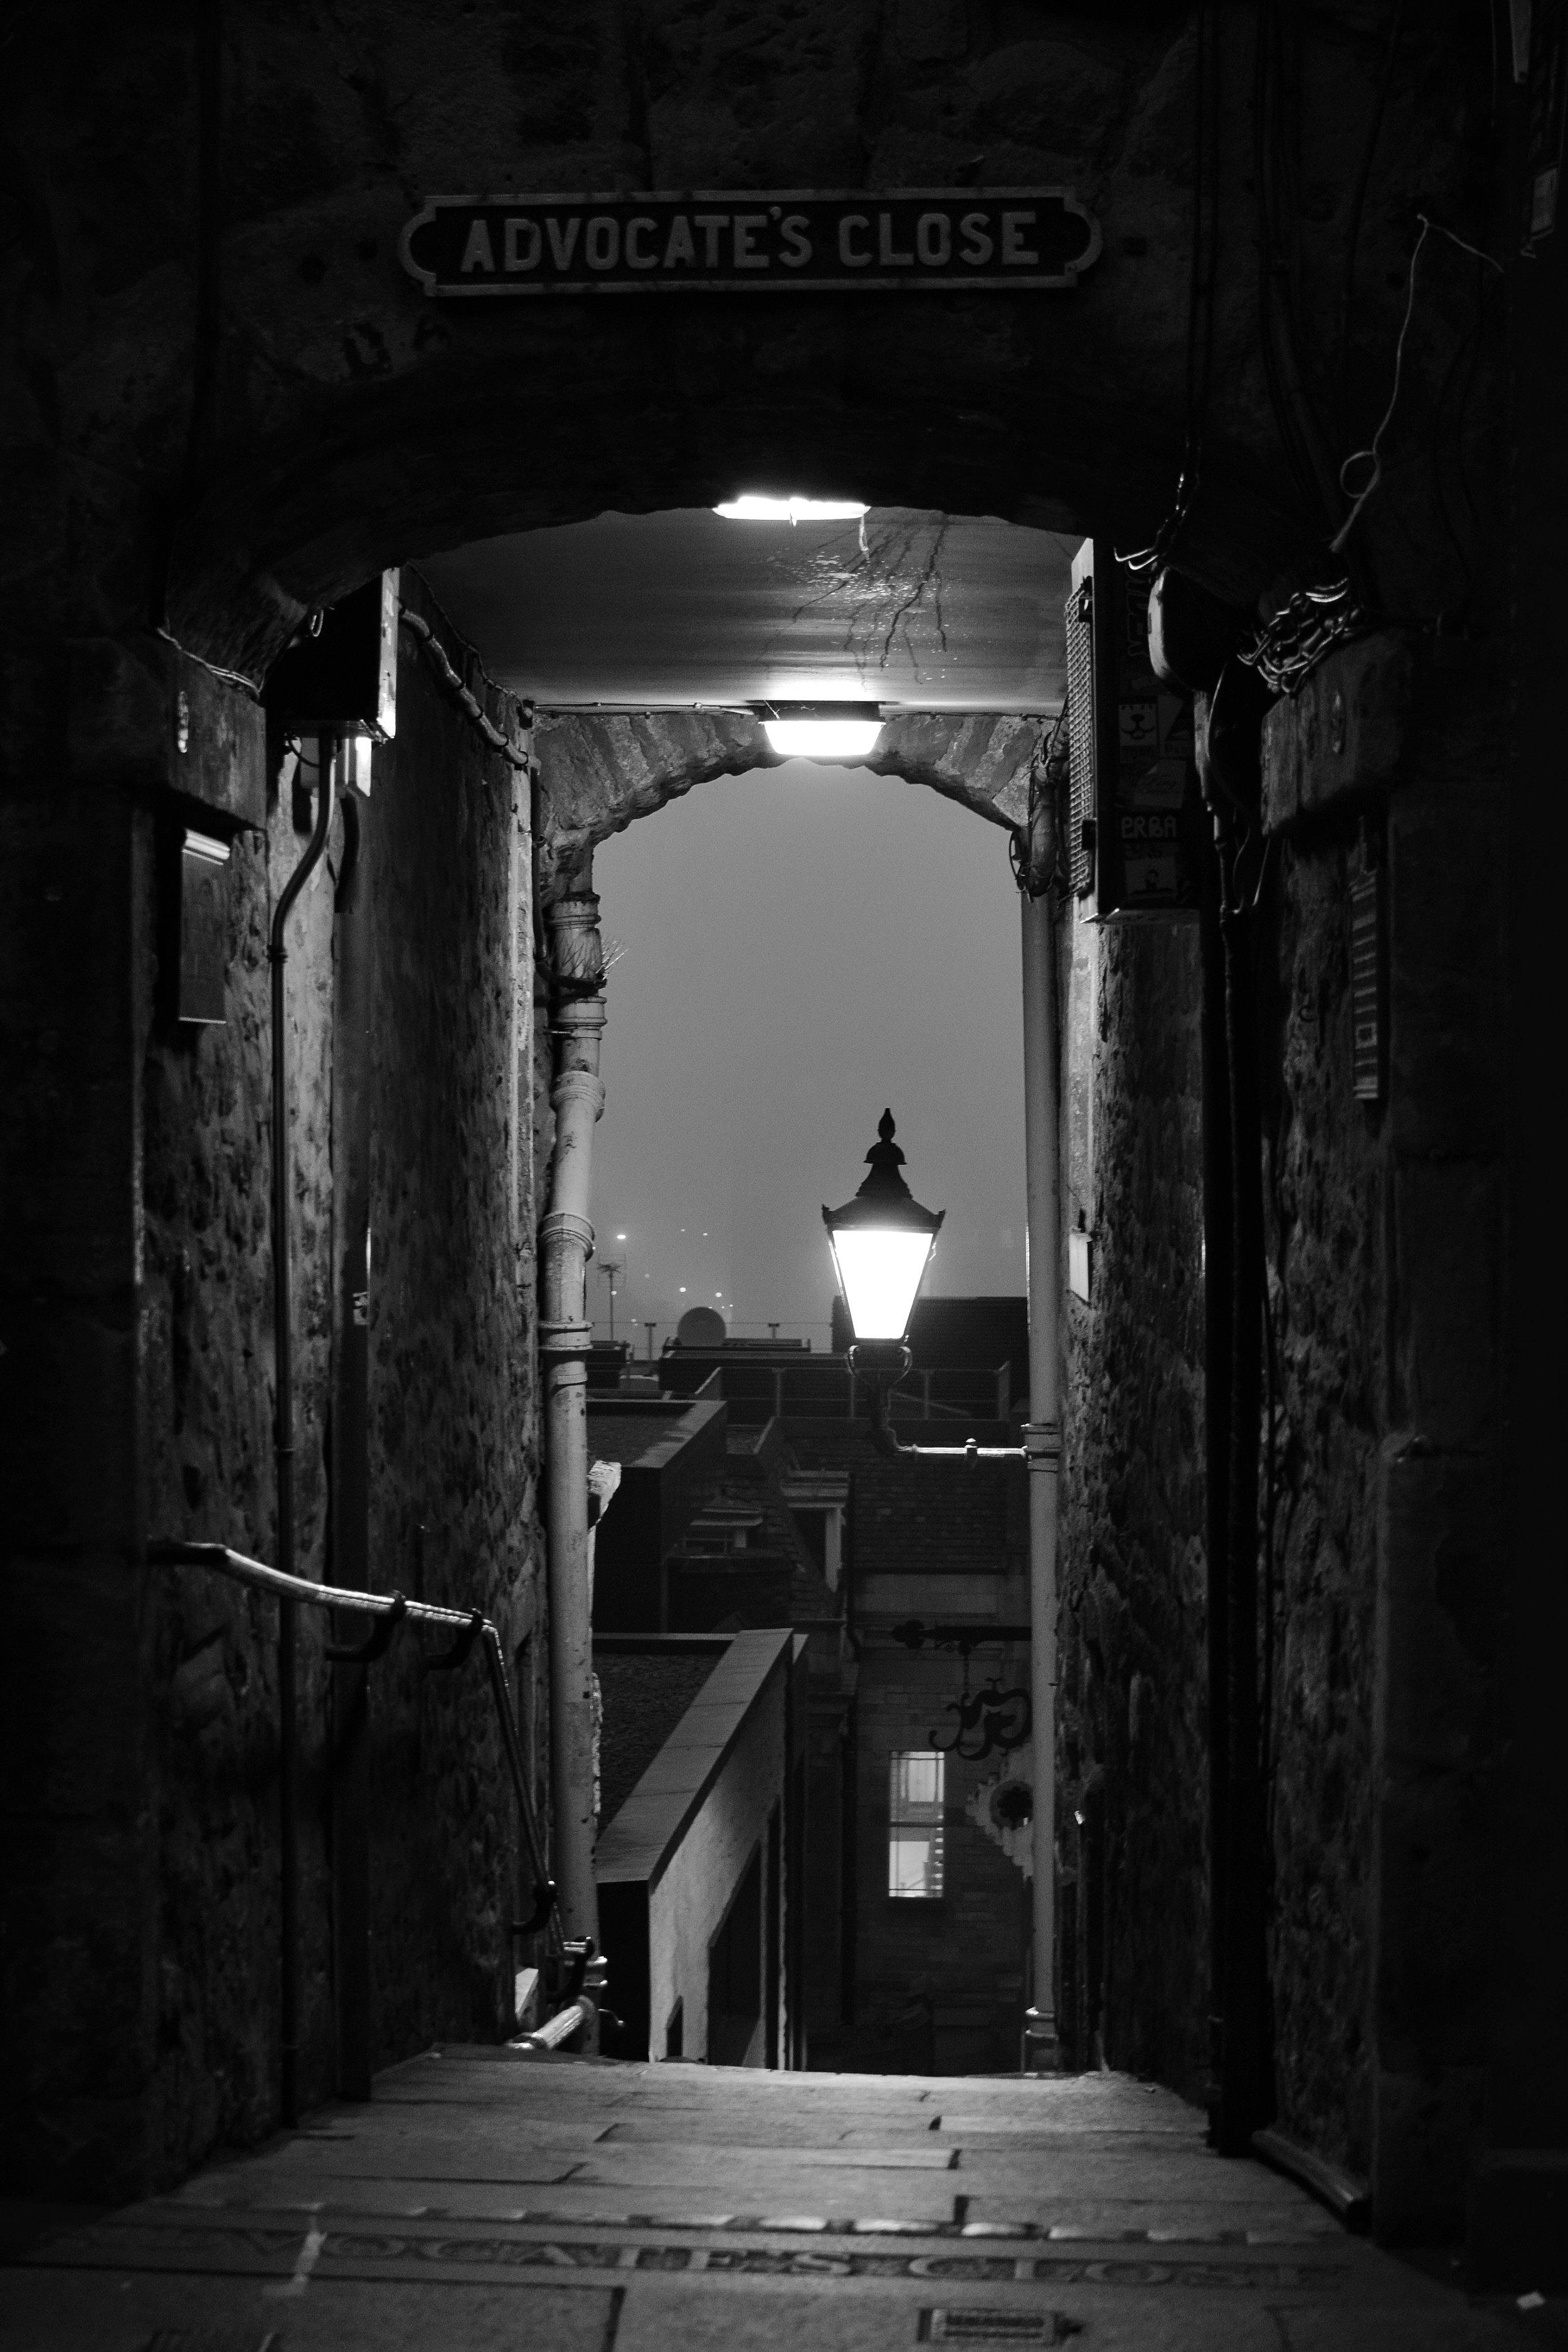 The Path Back Home (Advocate's Close, Edinburgh, Scotland)